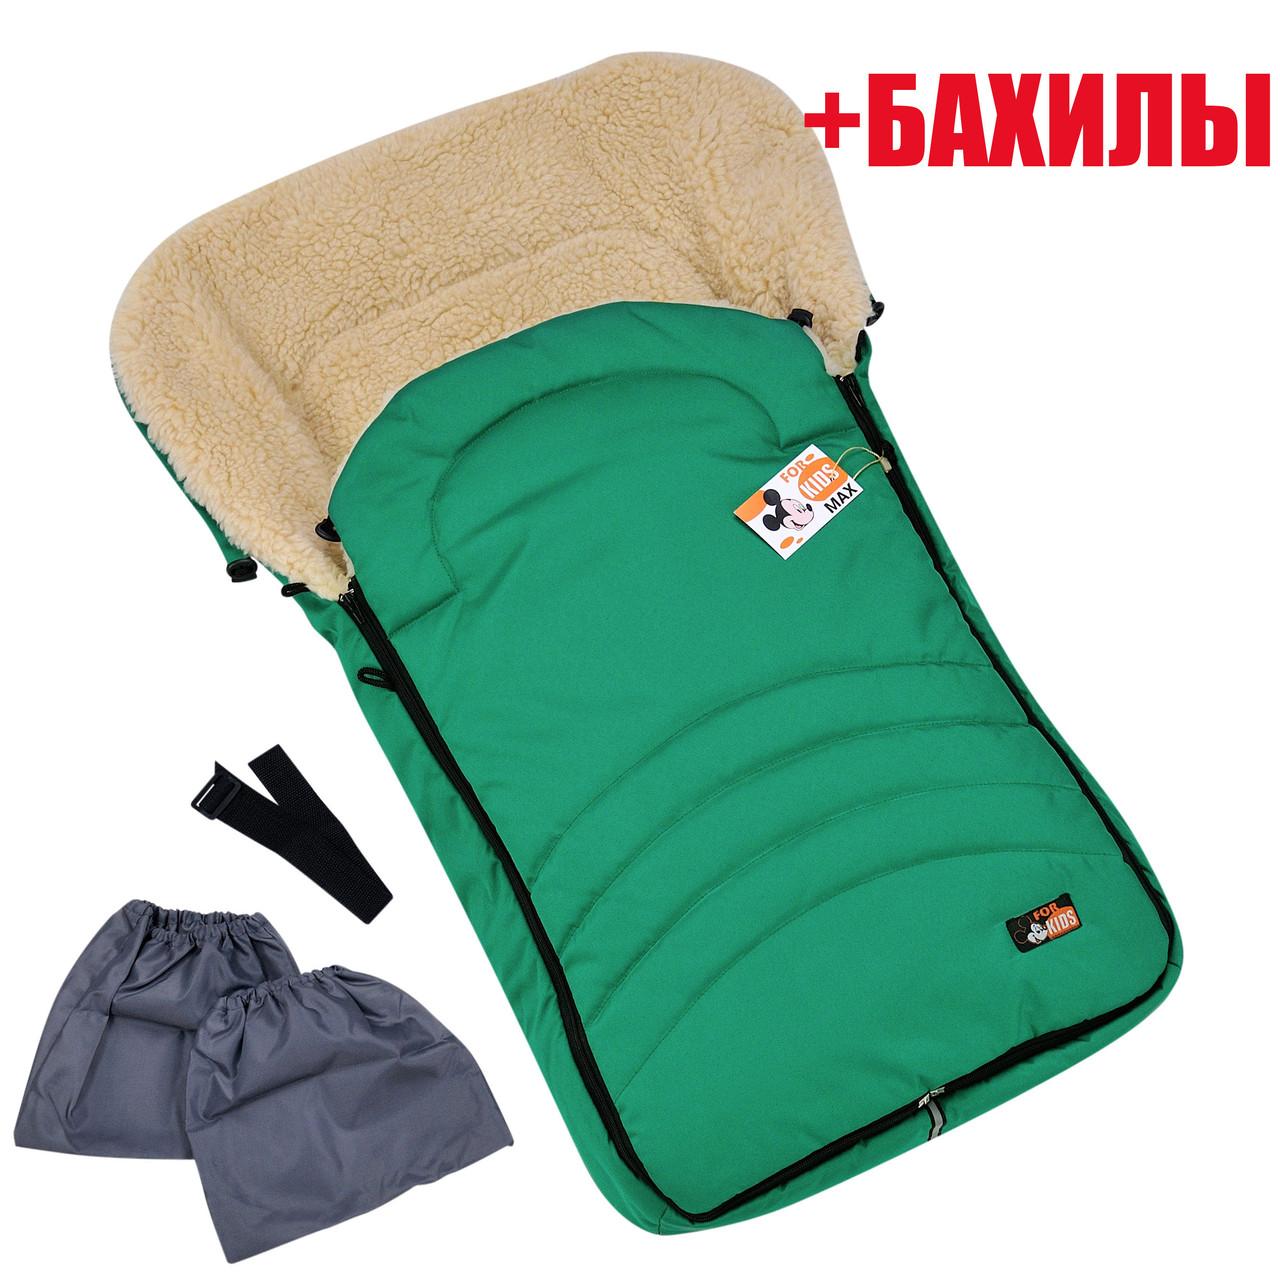 Конверт чехол зеленый на овчине в коляску или на санки 95*45см MAXI For Kids